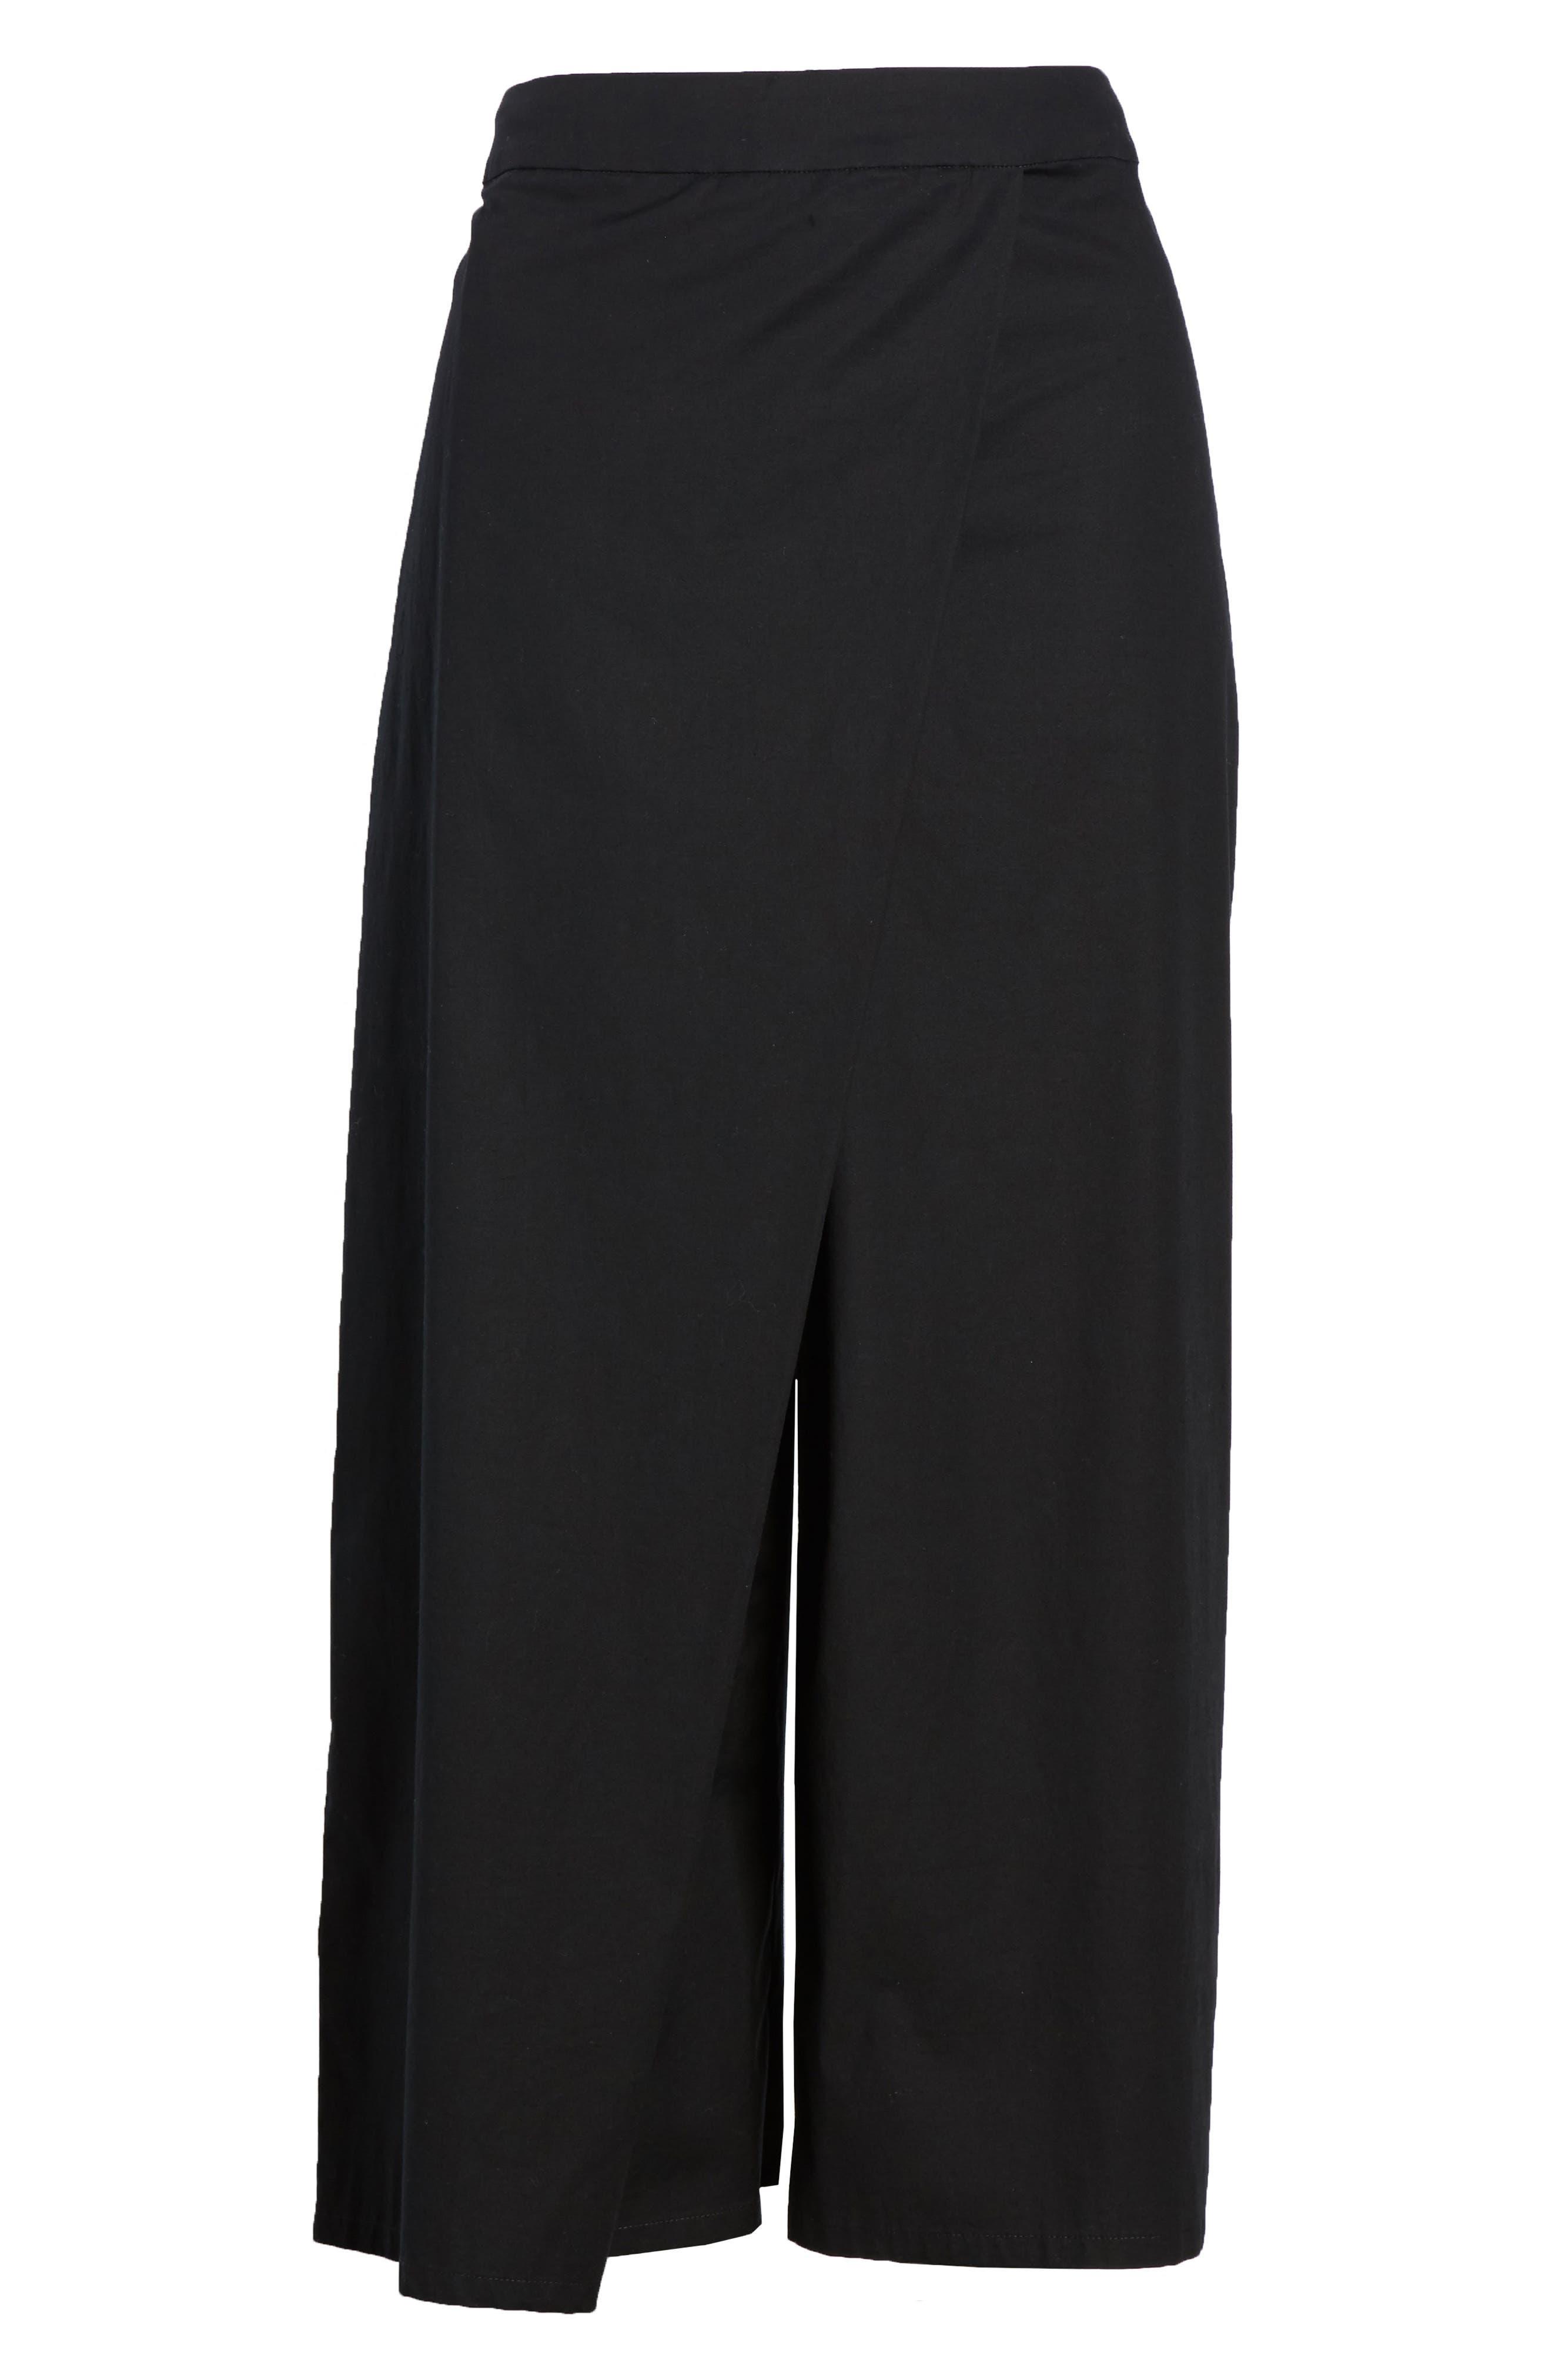 Foldover Wide Leg Crop Pants,                             Alternate thumbnail 7, color,                             Black